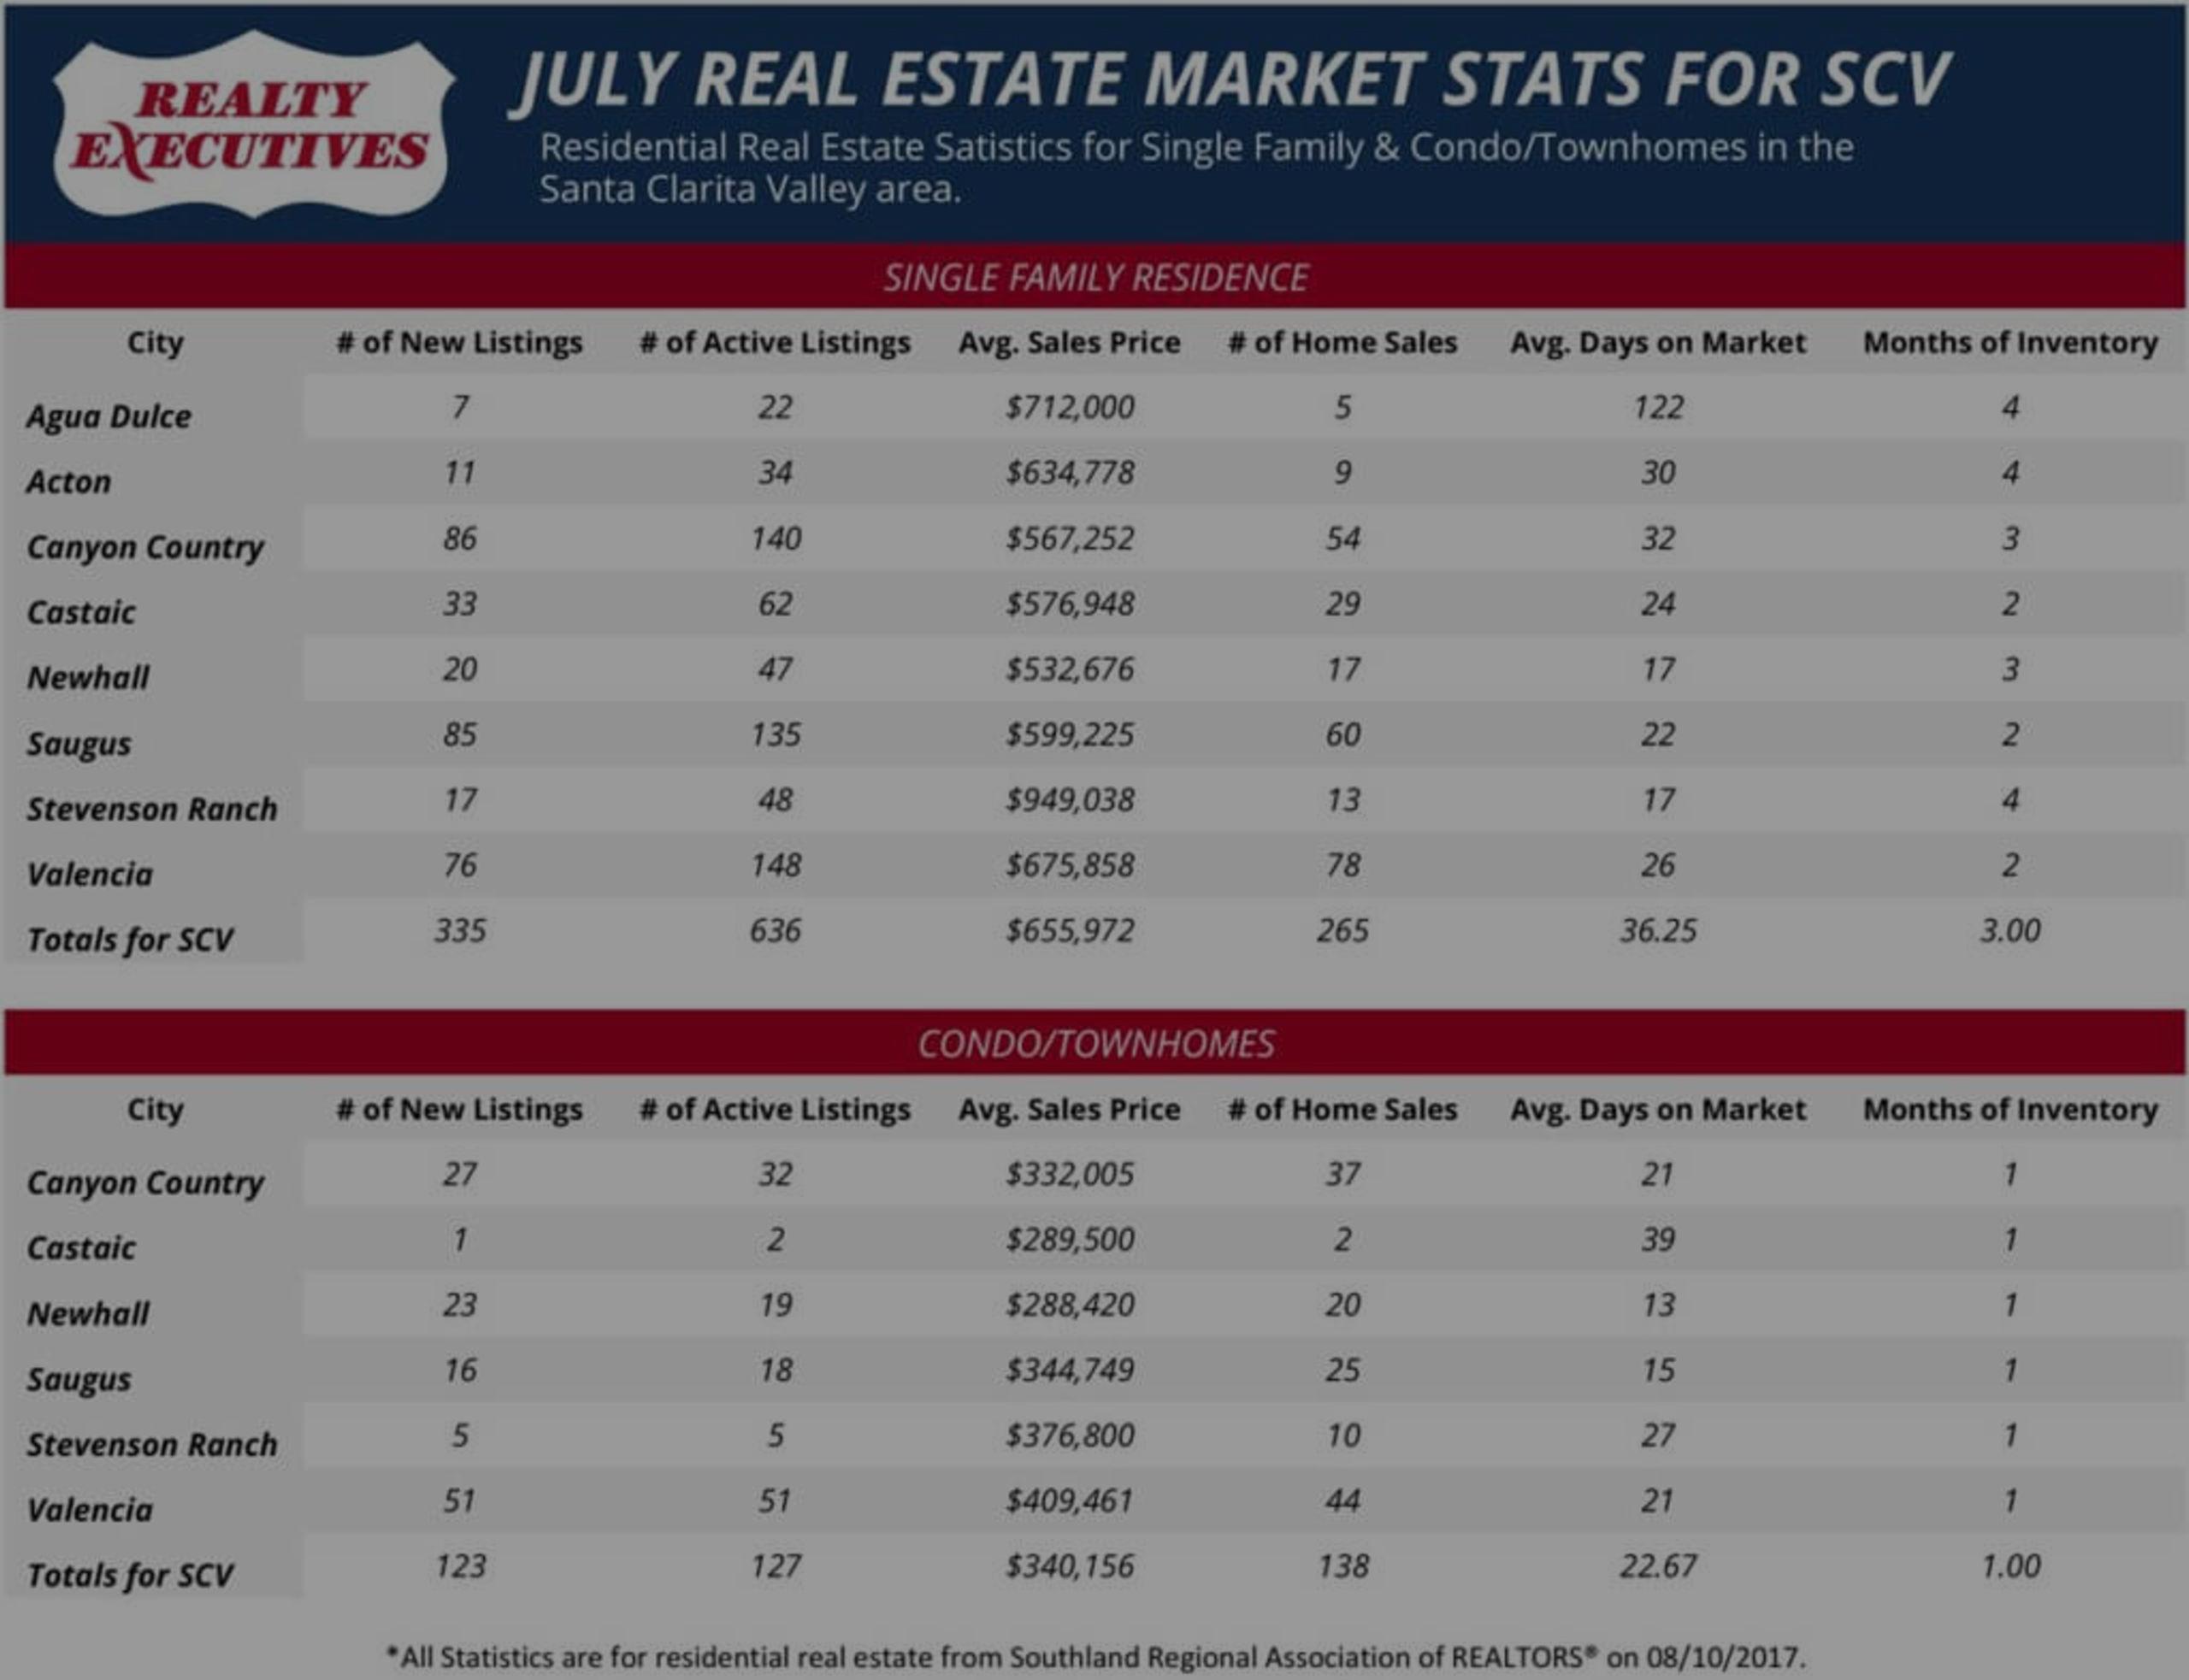 July 2017: Santa Clarita Real Estate Market Statistics